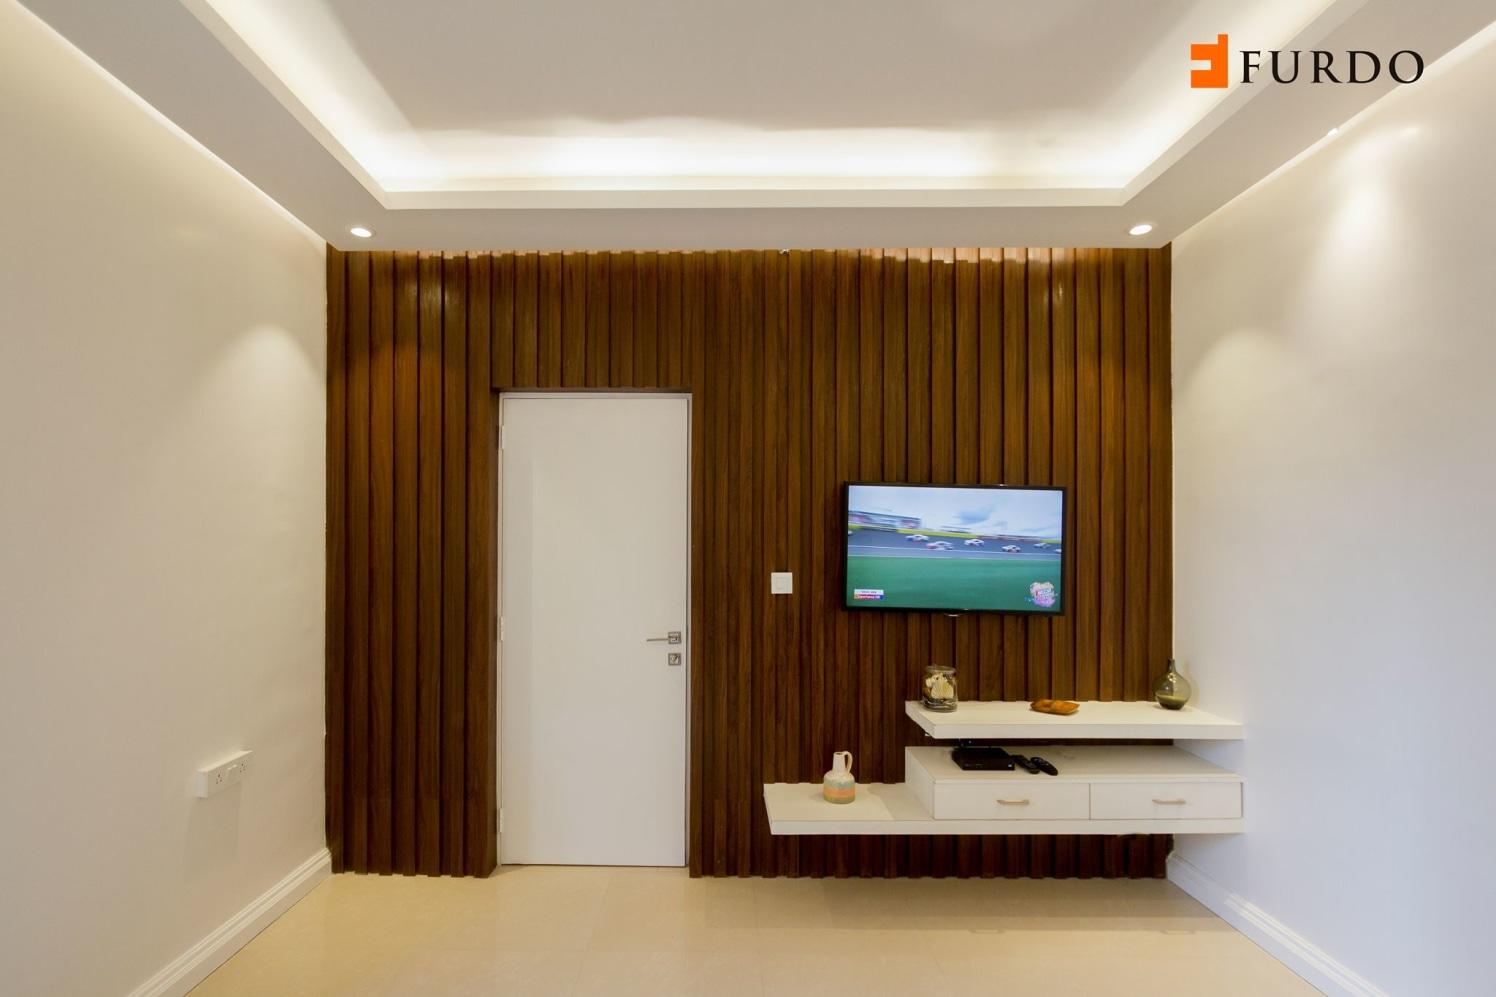 Living Room With Wooden Wall Art by Furdo.com Living-room Minimalistic | Interior Design Photos & Ideas